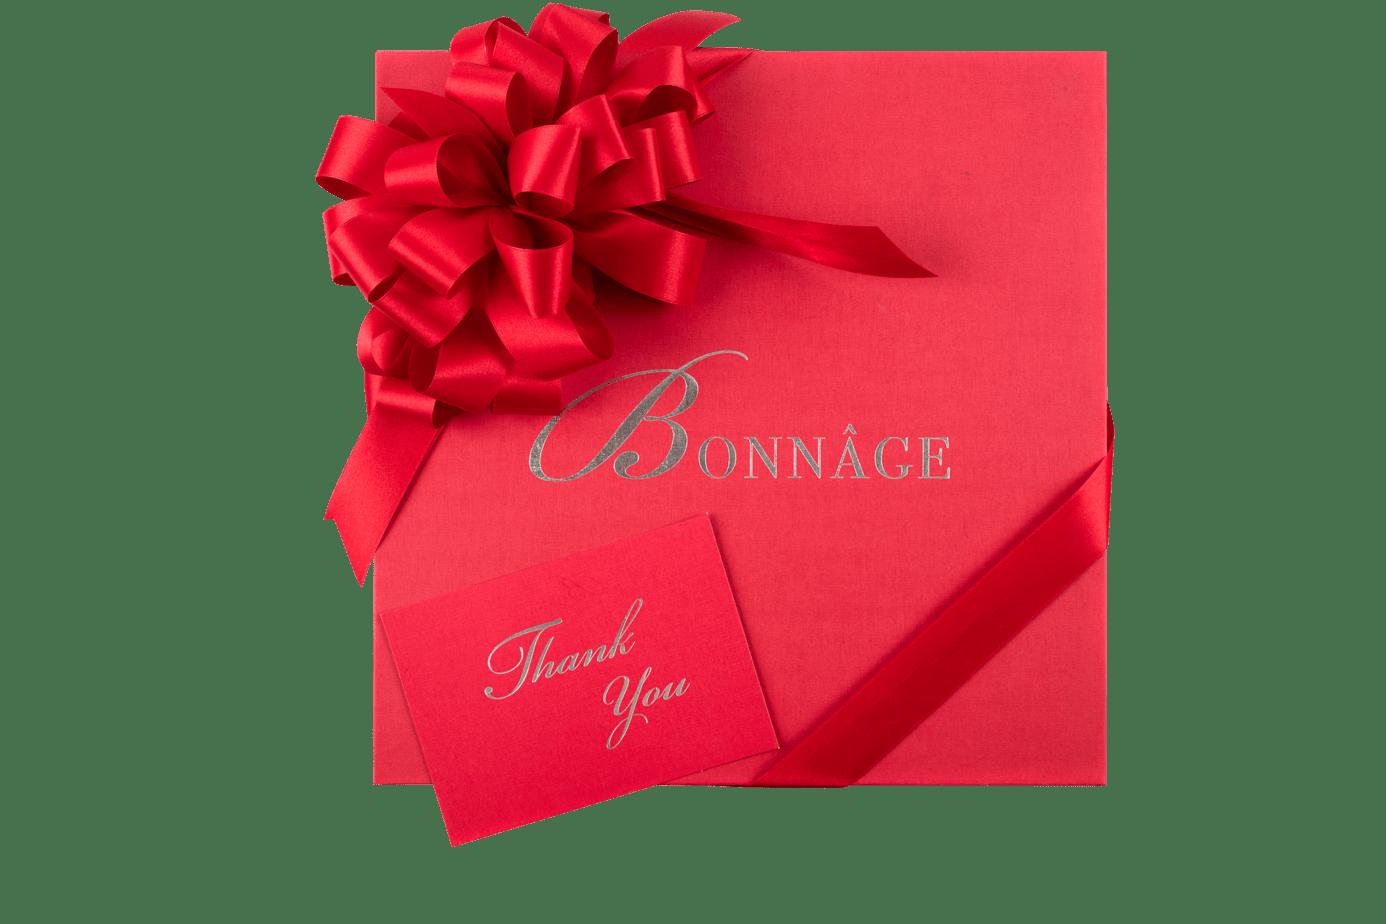 Bonnage Luxury Packaging